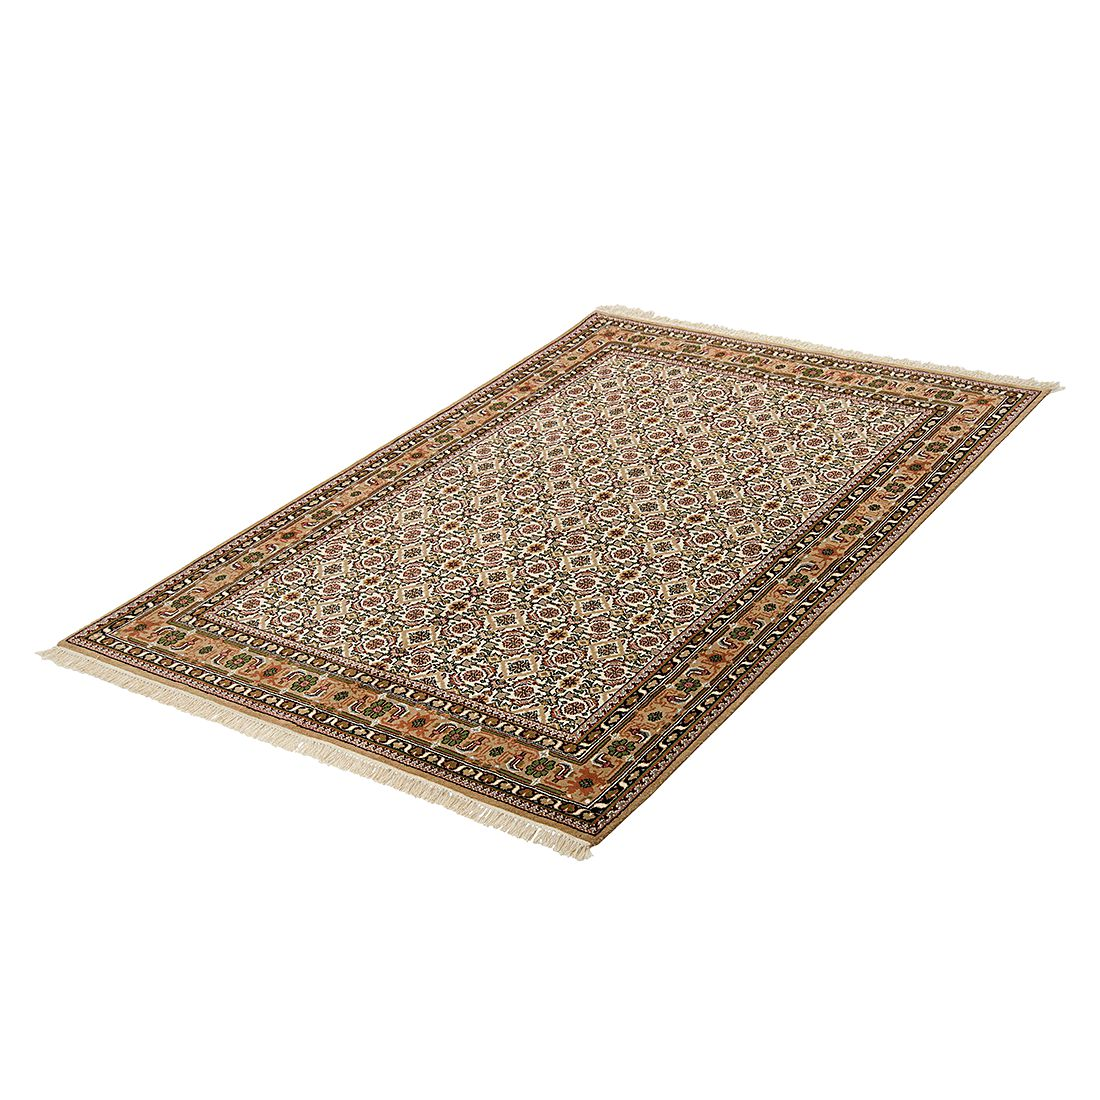 Teppich Matura Bidjar - Beige - 200cm x 300cm, Parwis